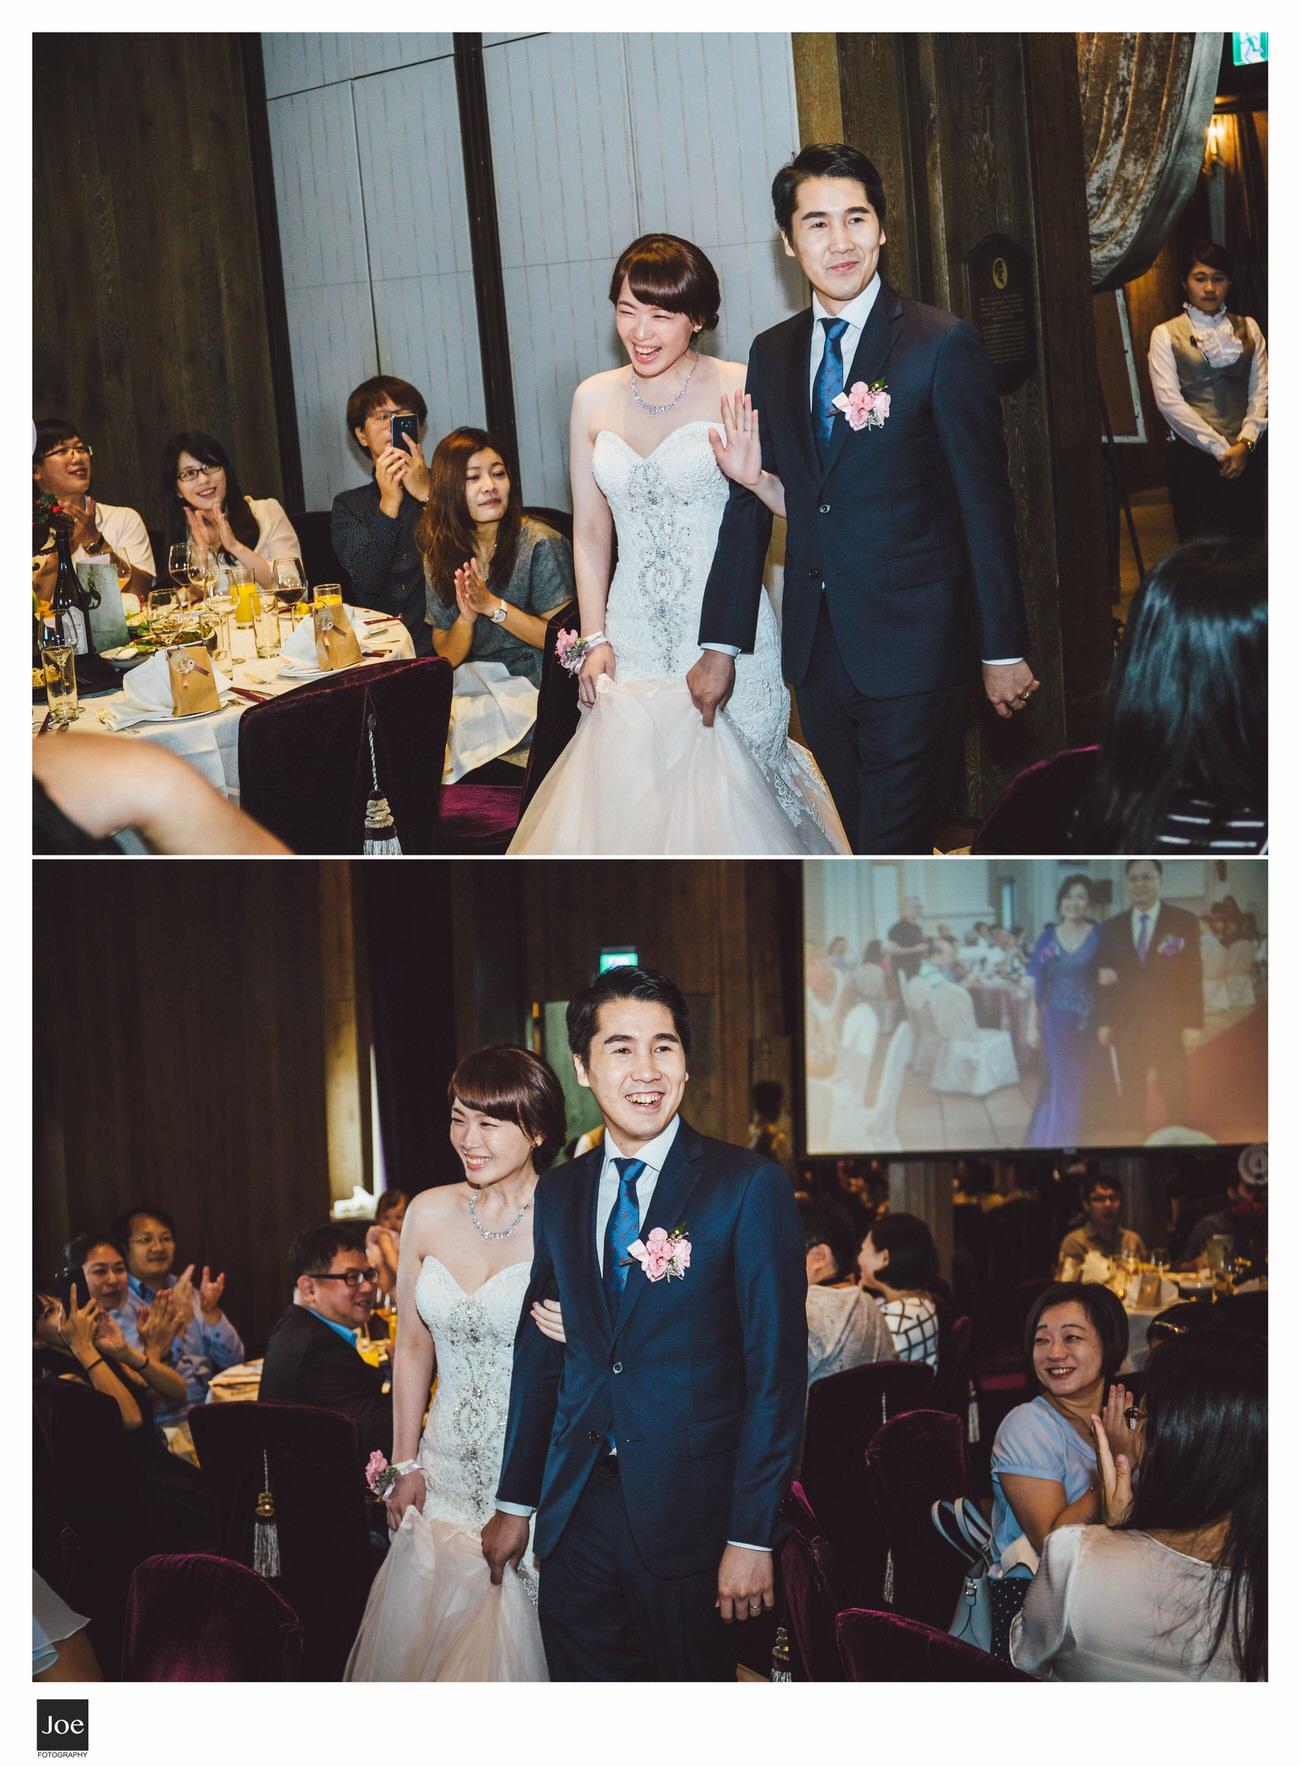 joe-fotography-wedding-photo-palais-de-chine-hotel-021.jpg